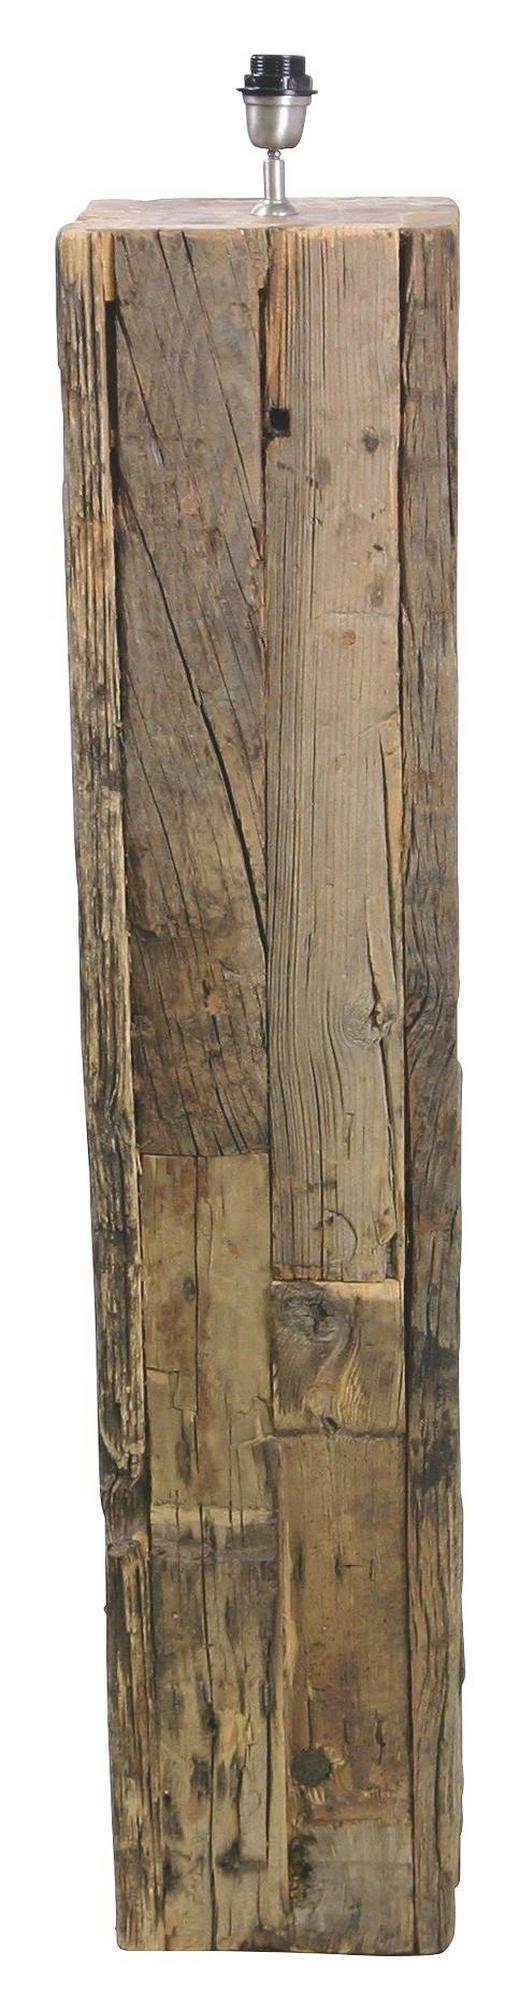 LEUCHTENFUß  Braun  Holz - Braun, Natur, Holz (25/25/120cm)